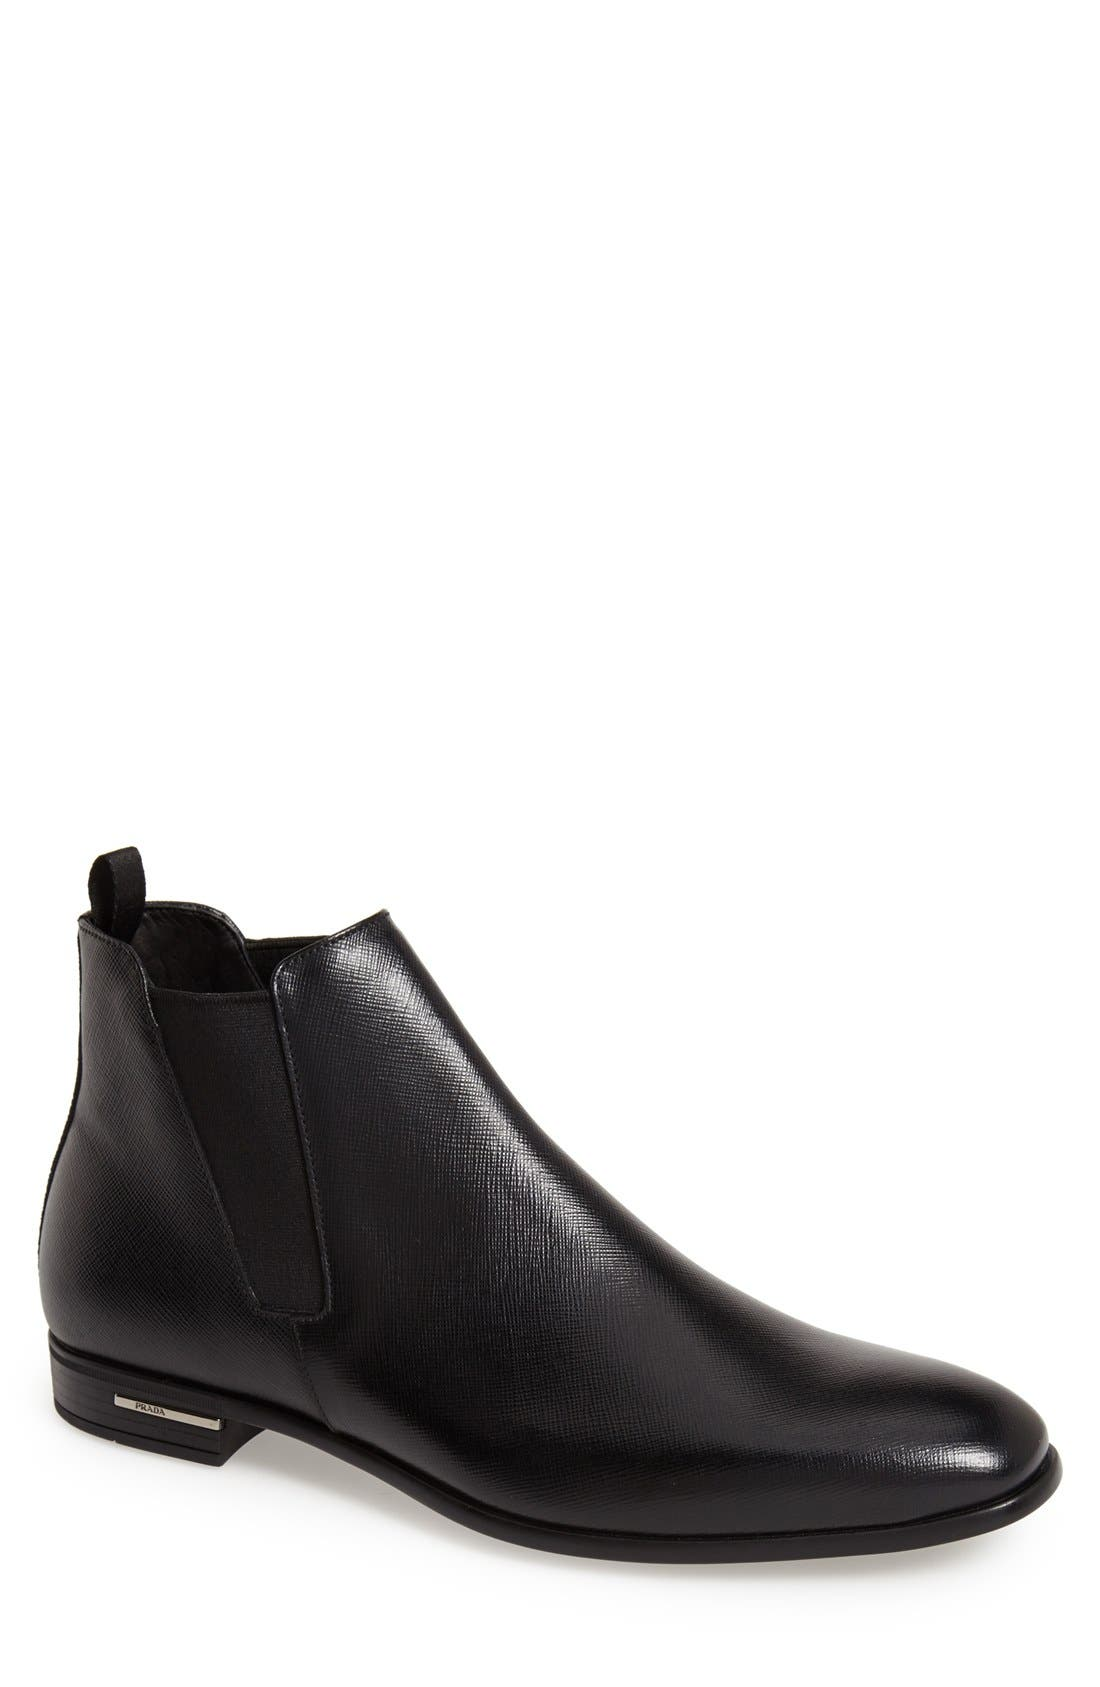 PRADA, Saffiano Leather Chelsea Boot, Main thumbnail 1, color, BLACK